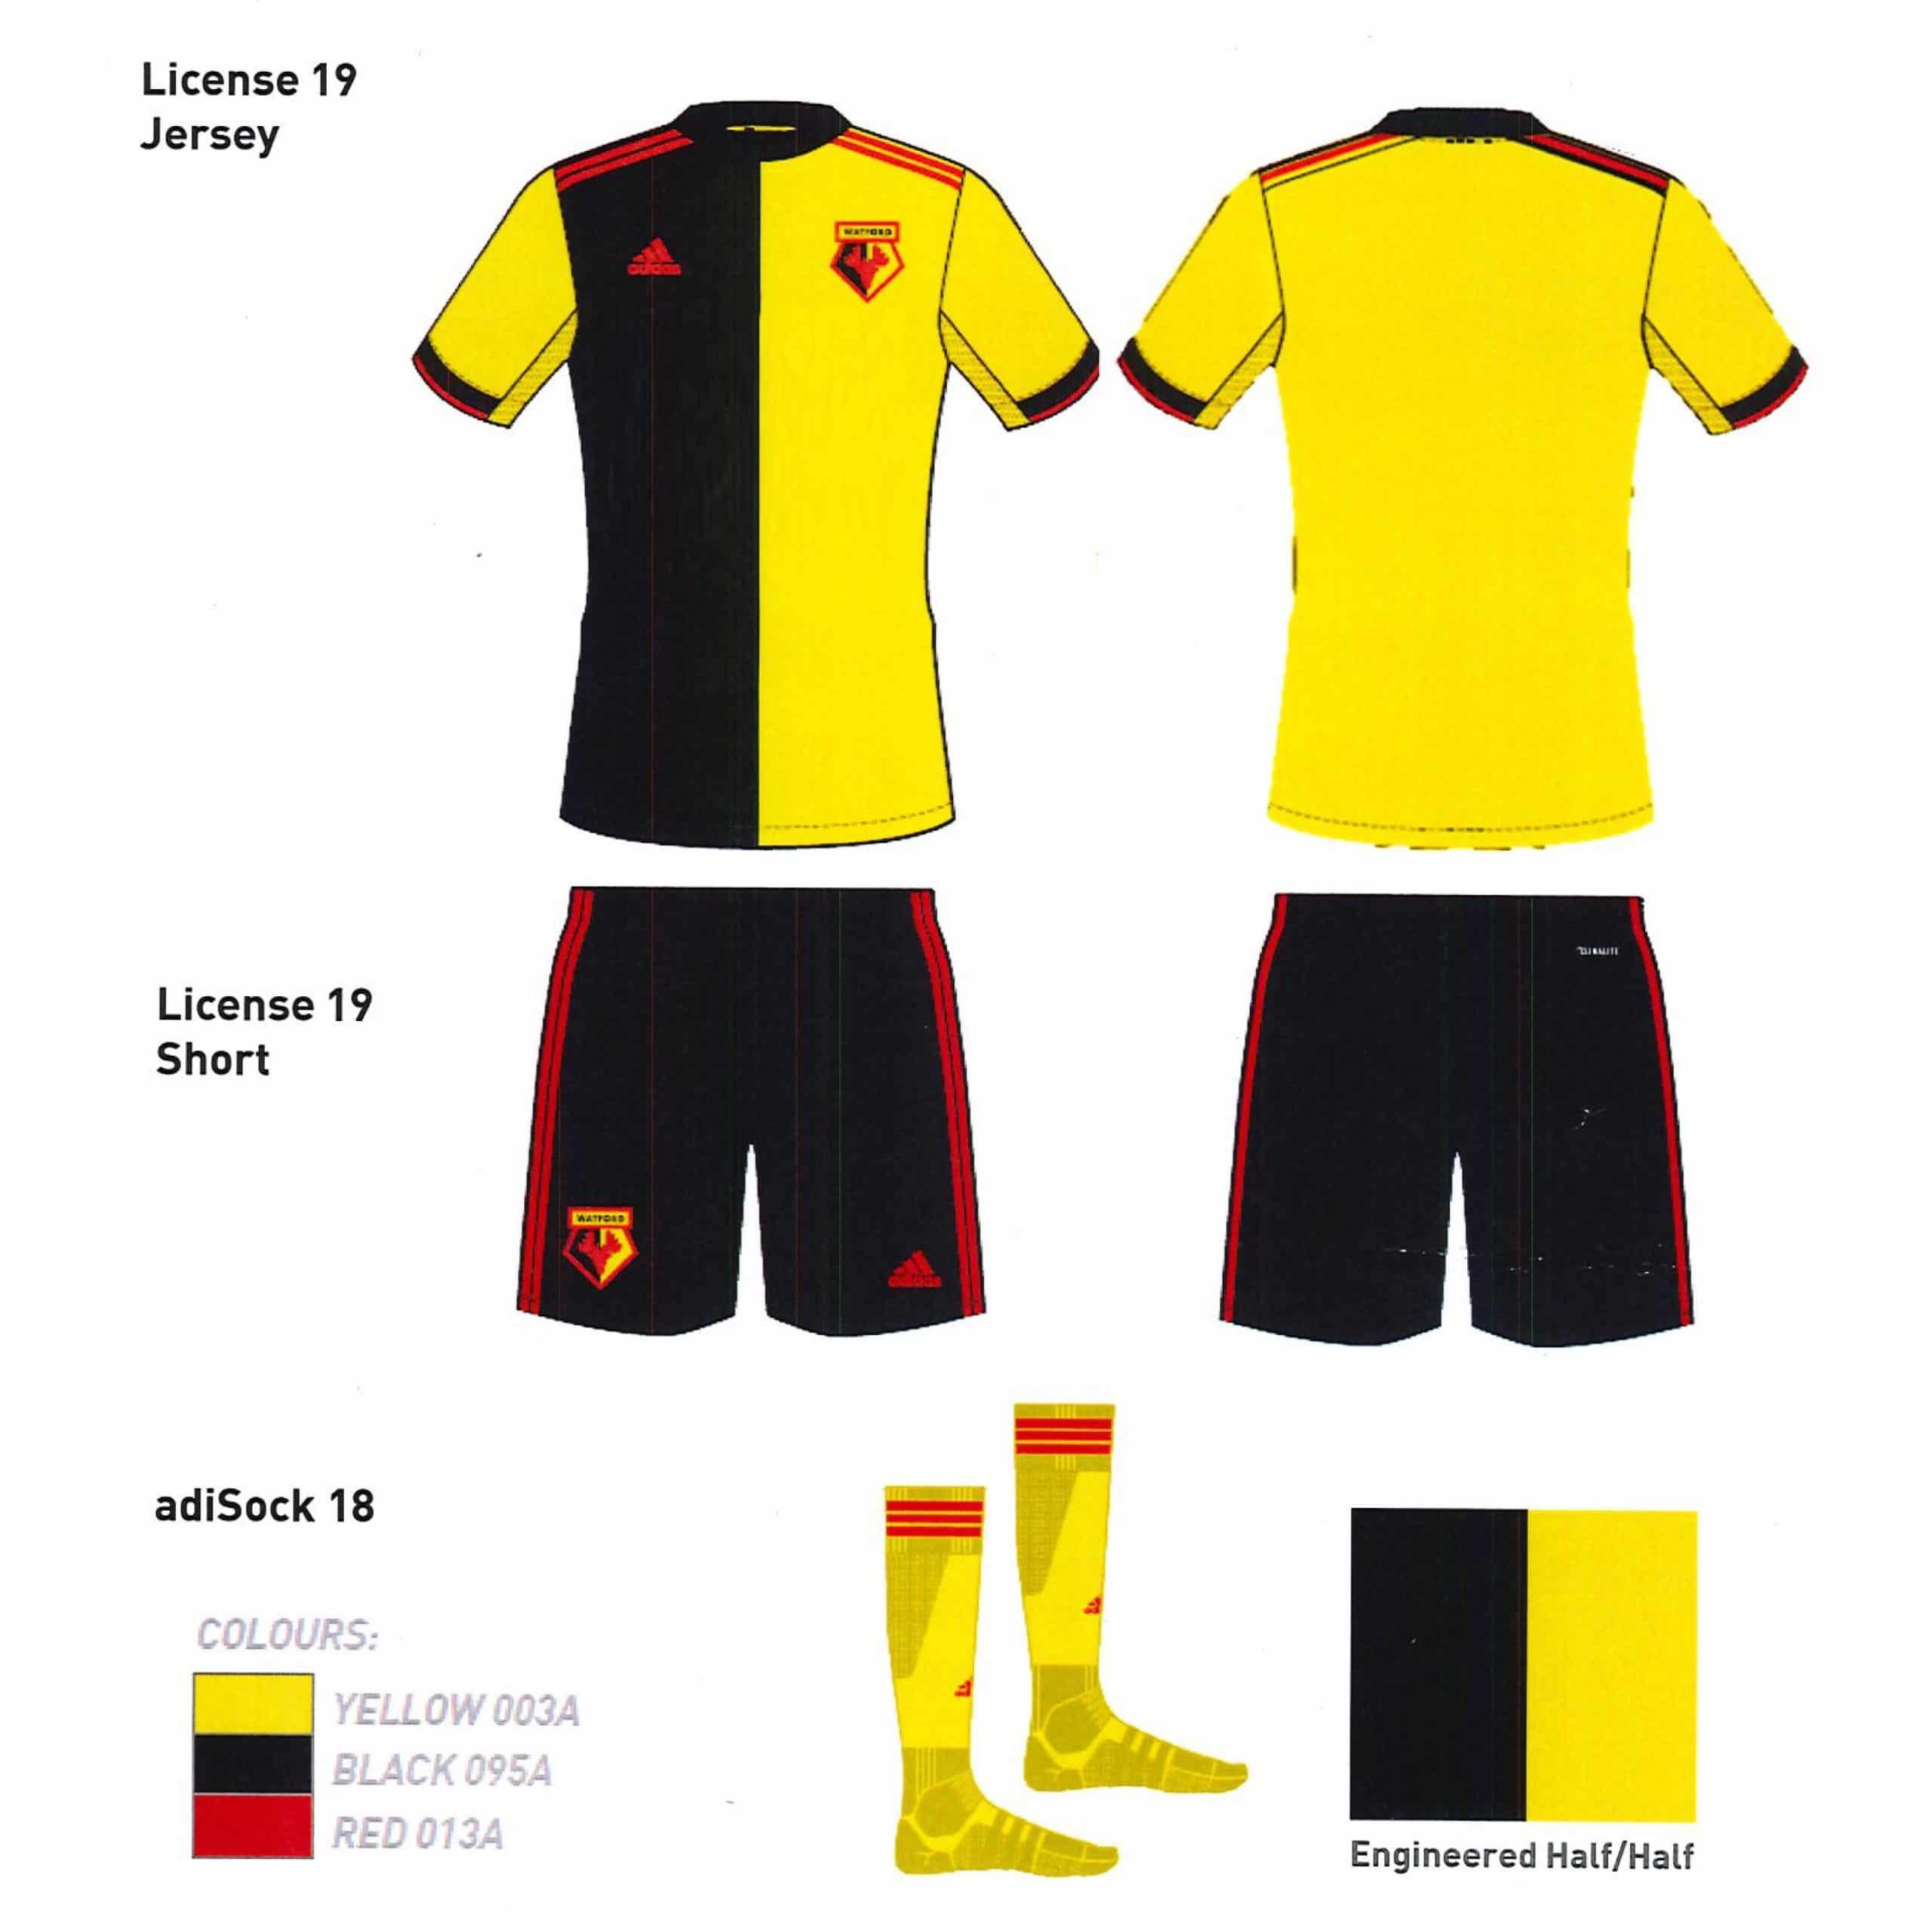 03f17c09a87 Watford 2019-20 Adidas Home Kit Design | The Kitman